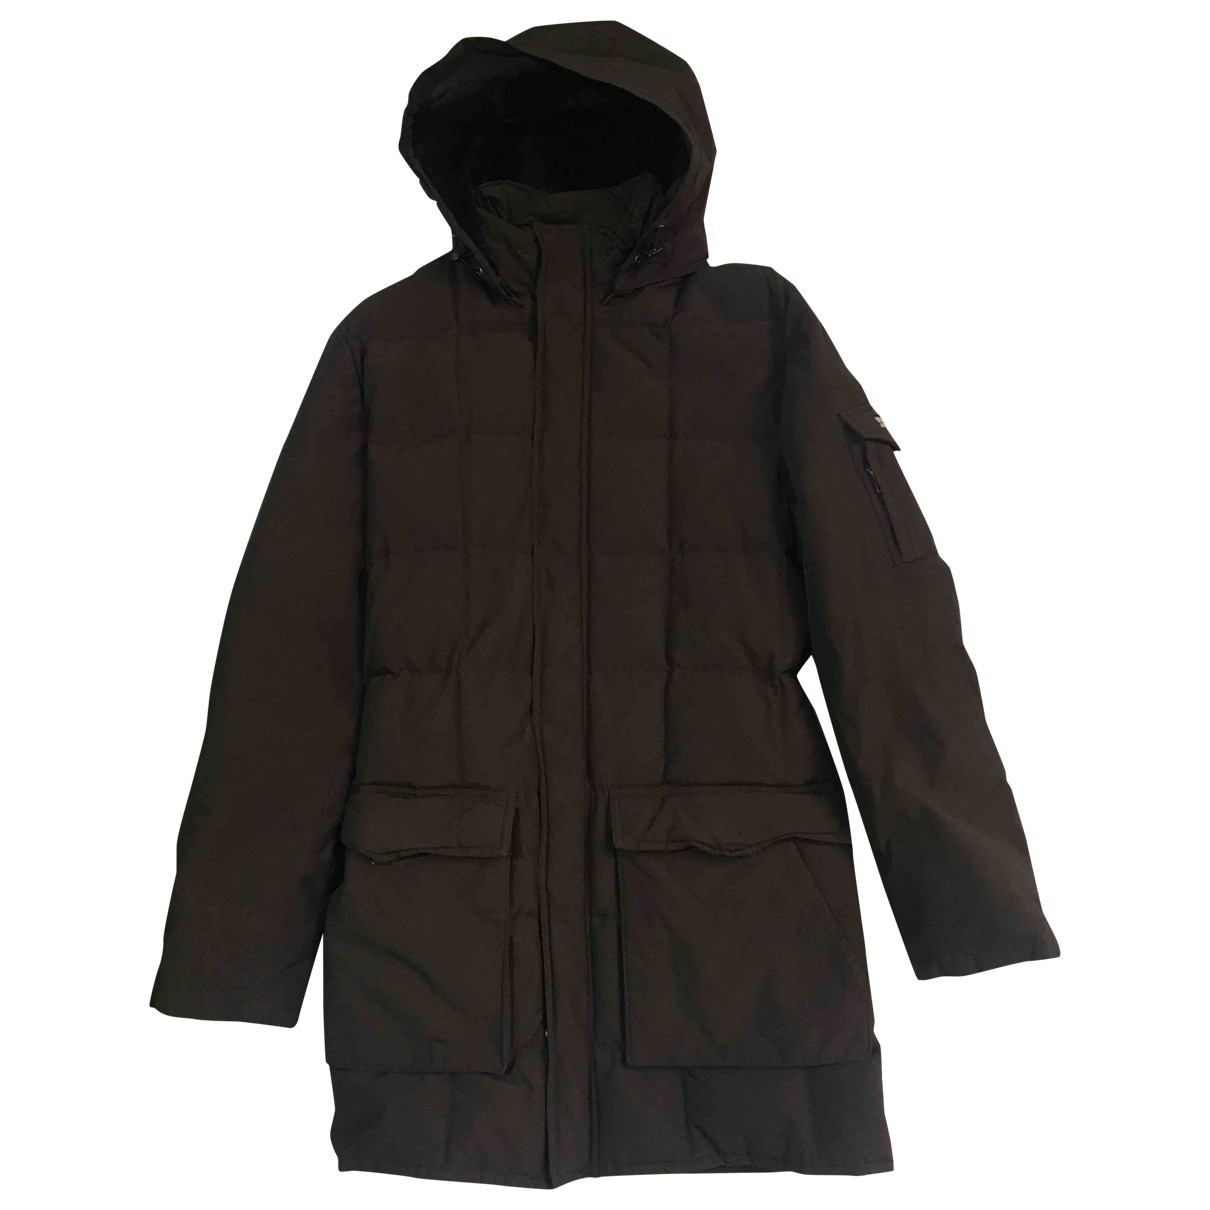 Woolrich \N Brown jacket  for Men XL International